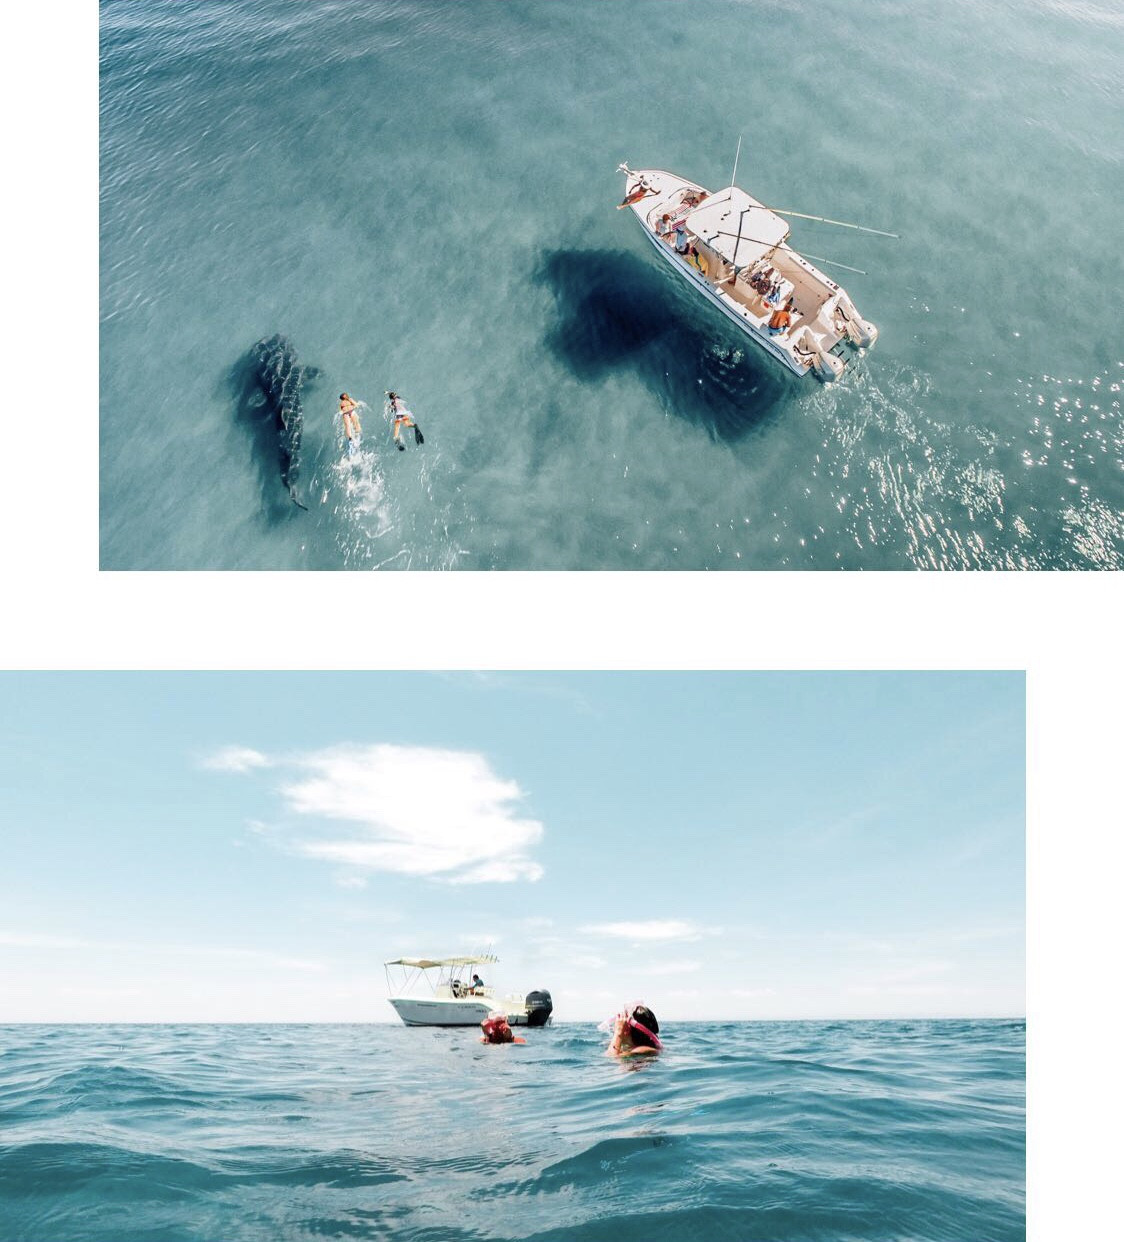 Top image: BACo Adventures